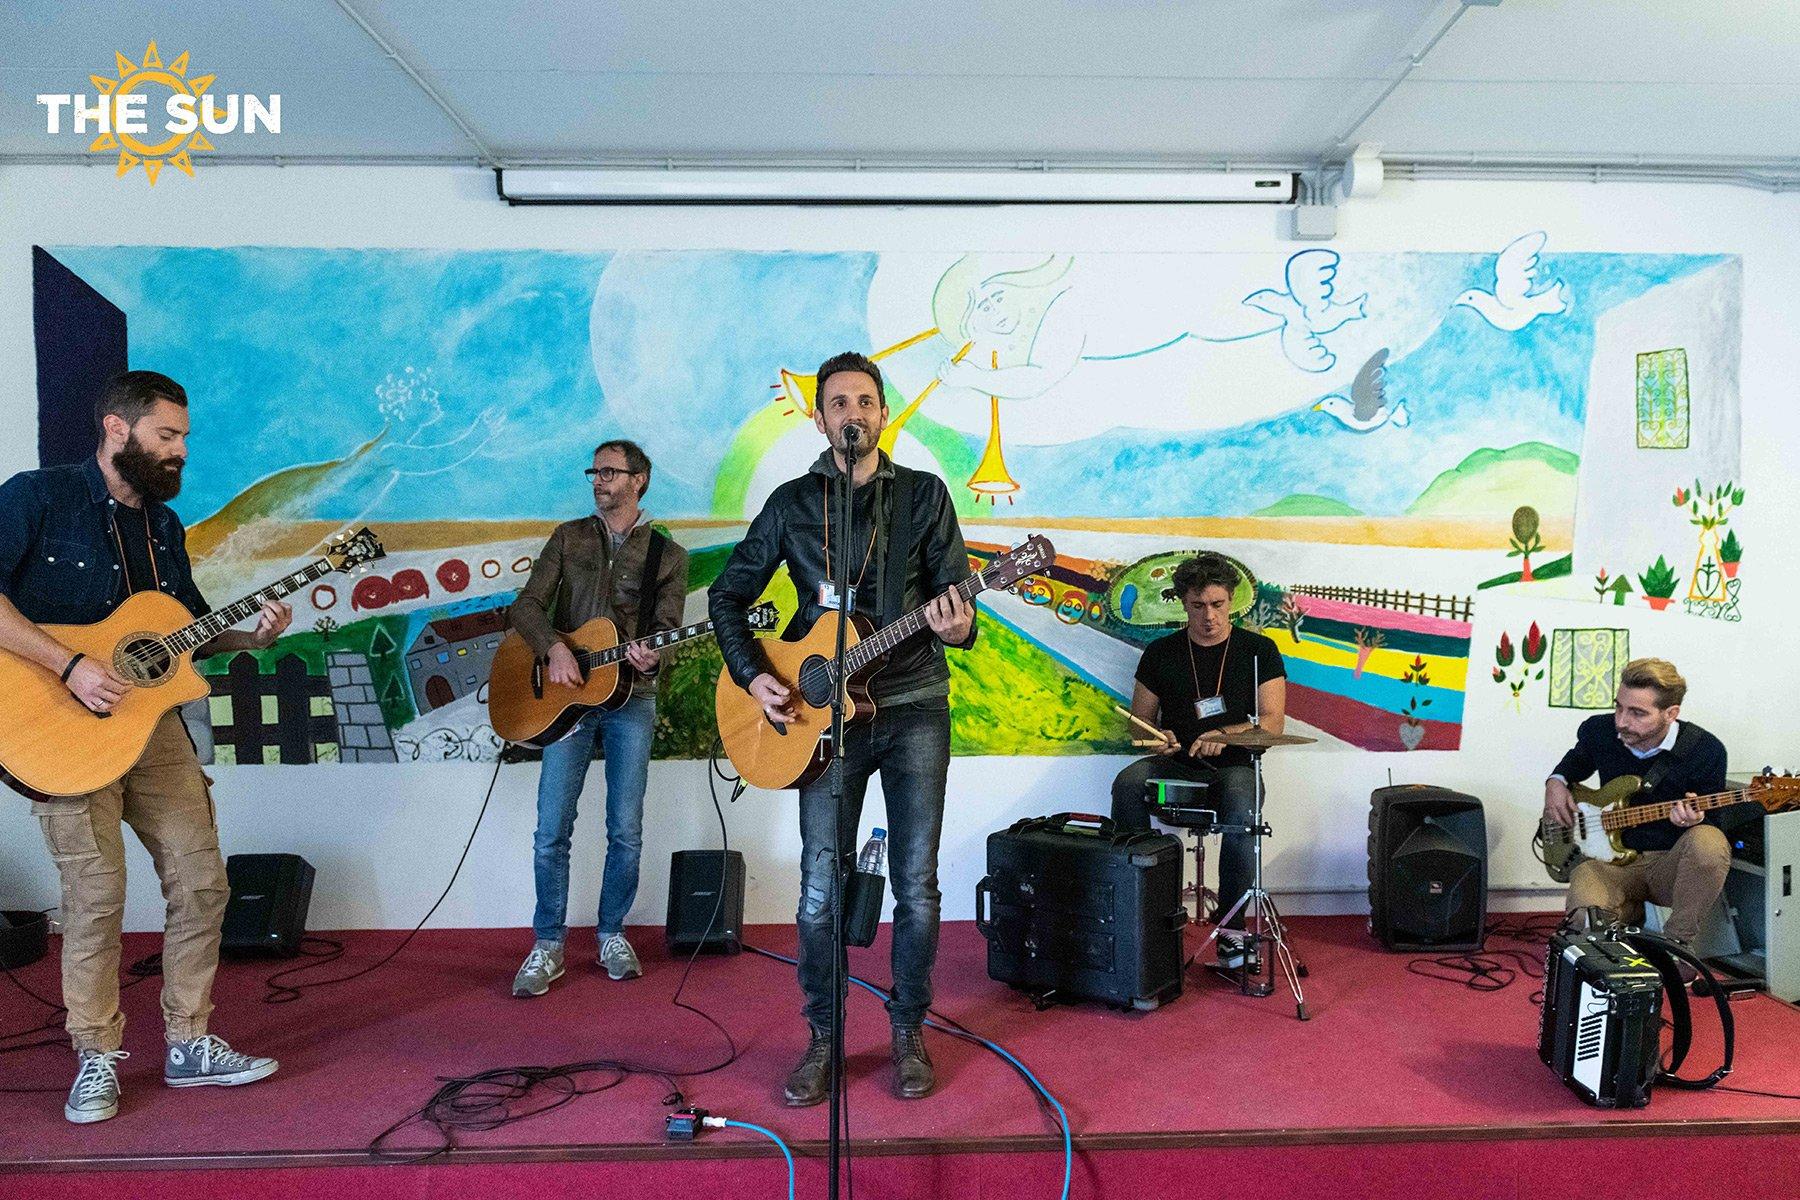 the sun rock band carcere vicenza